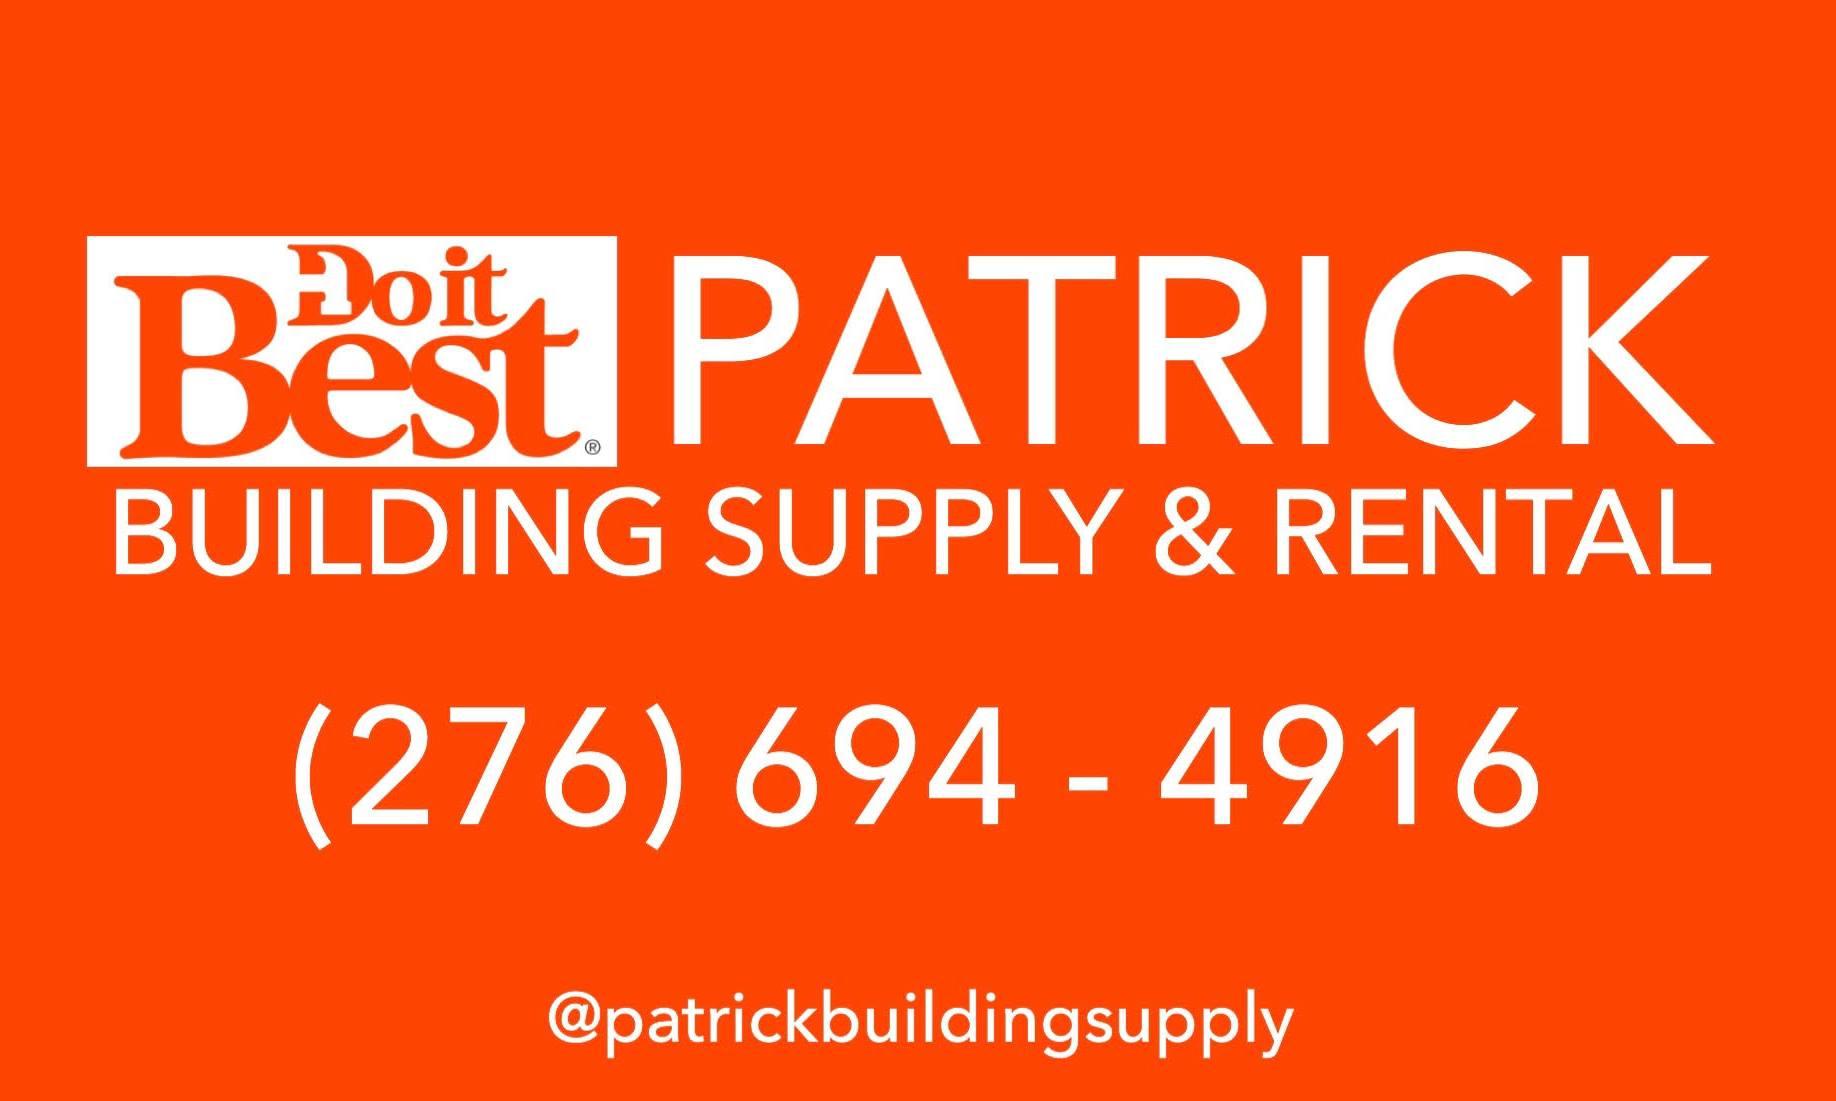 Patrick Building Supply